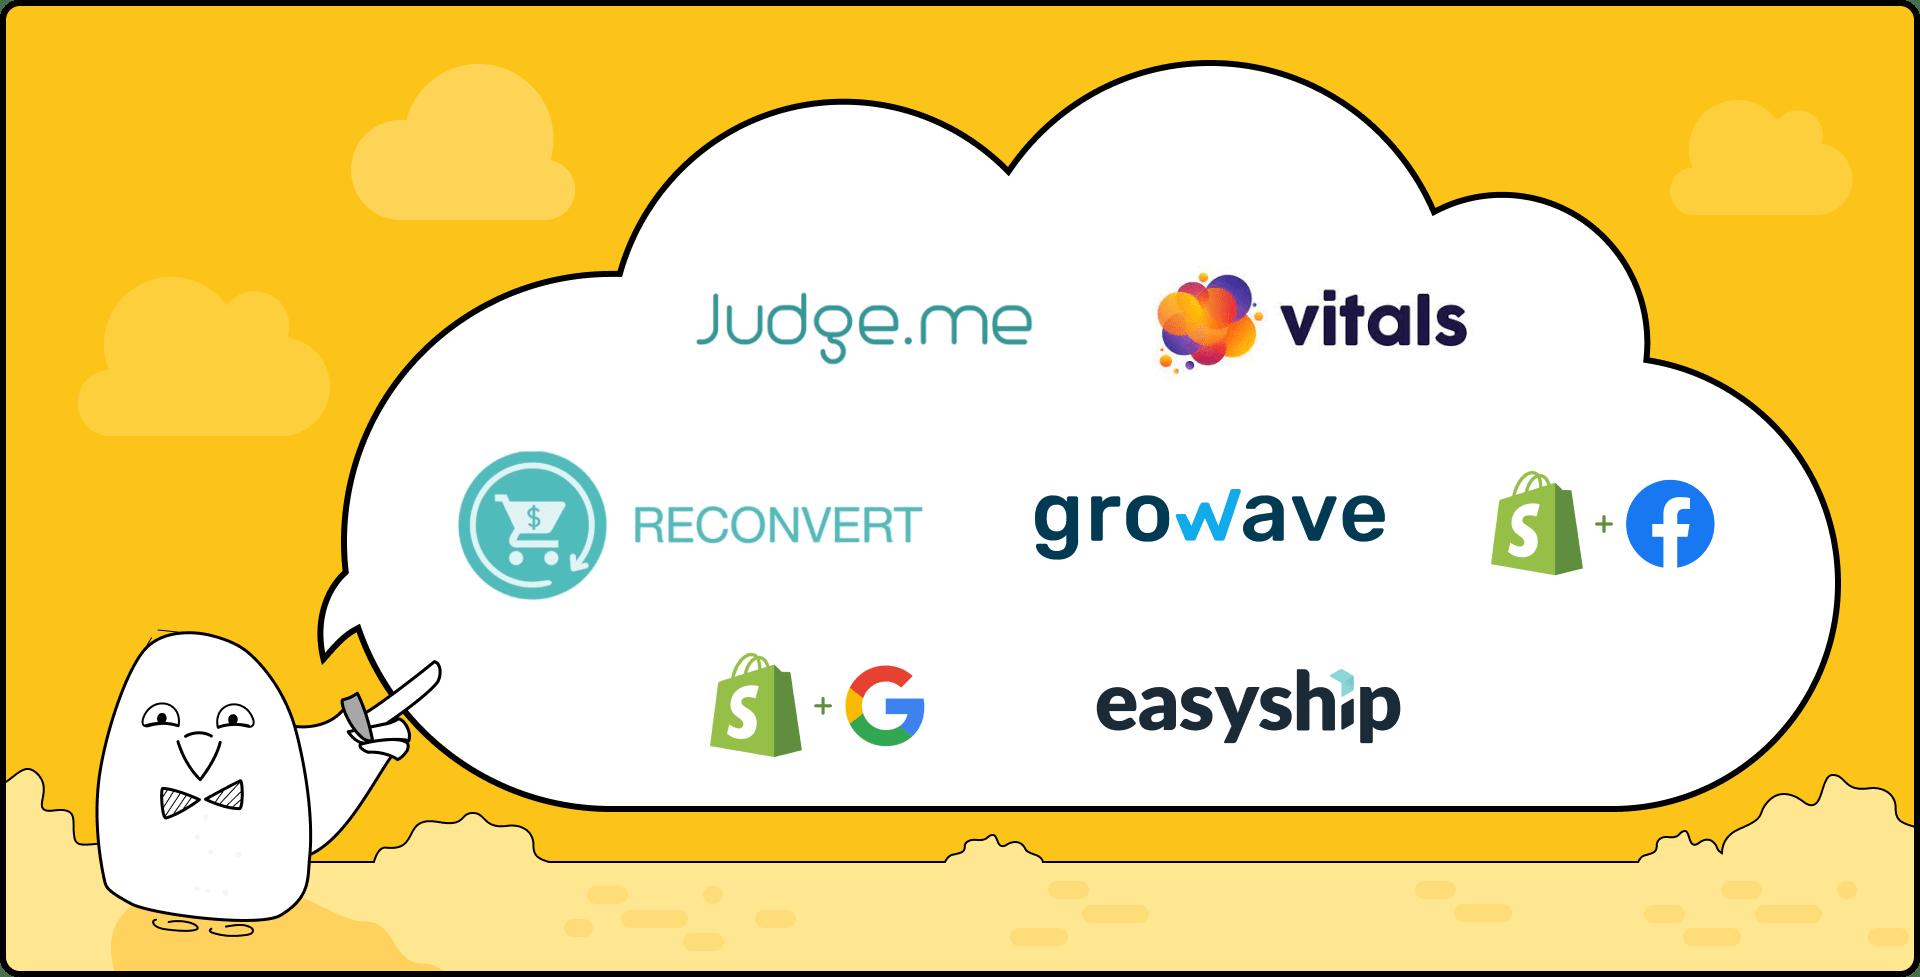 Shopify Apps logos: Judge.me, Vitals, ReConvert, Growave, EasyShip, Facebook channel, Google channel